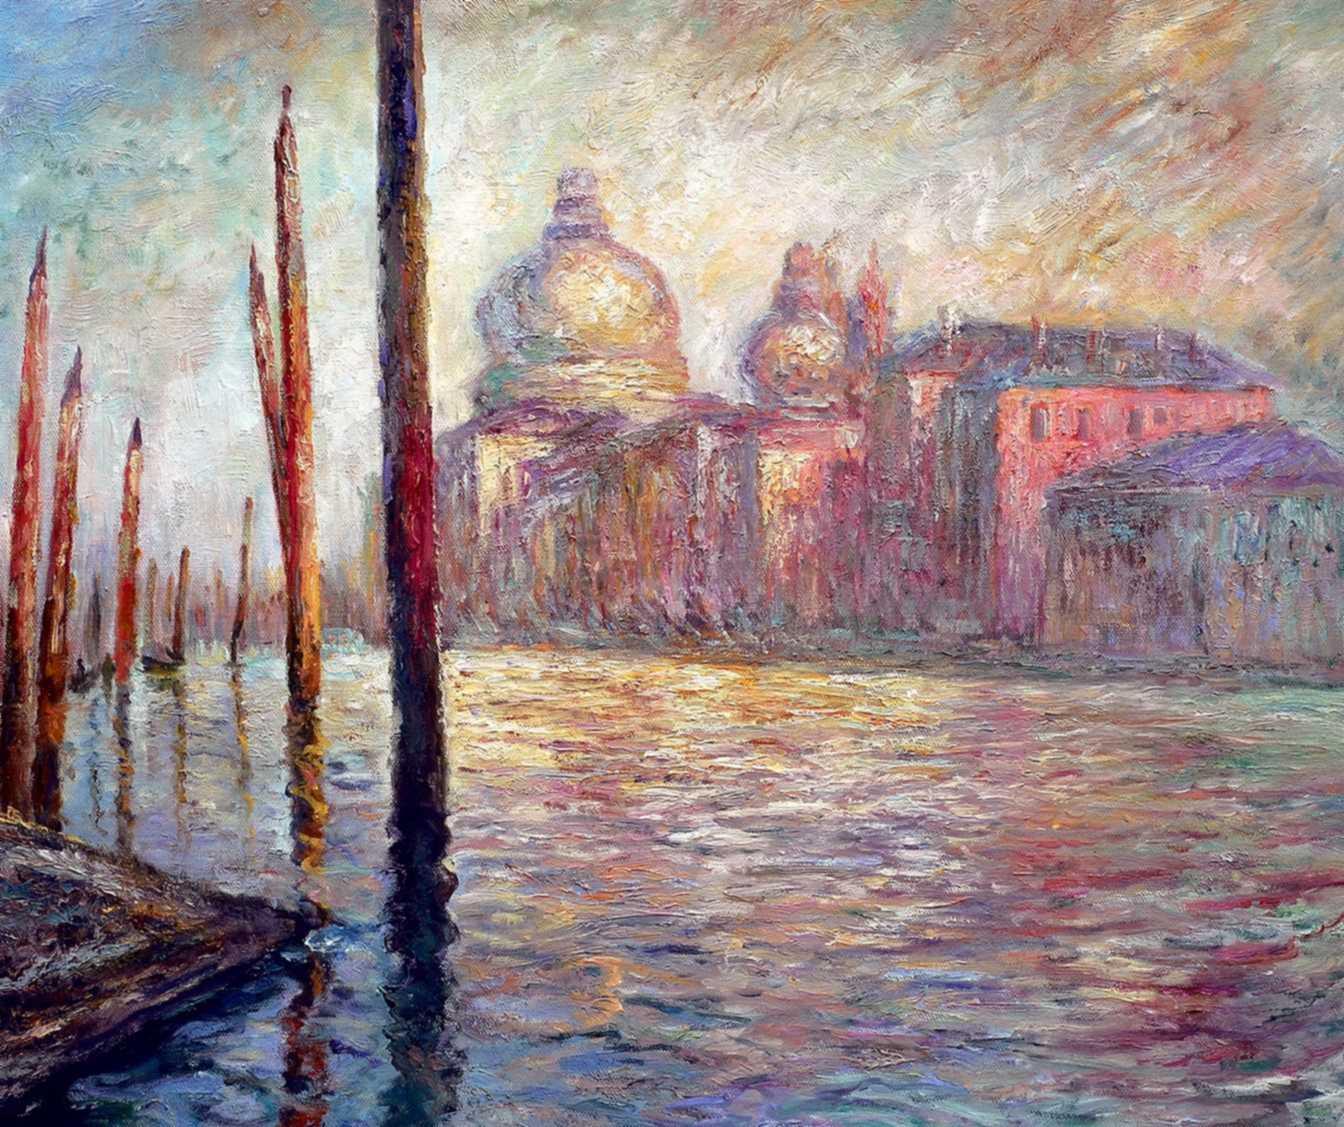 Claude Monet - Blick auf Venedig c95986 50x60cm exzellentes Ölgemälde handgemalt Museumsqualität